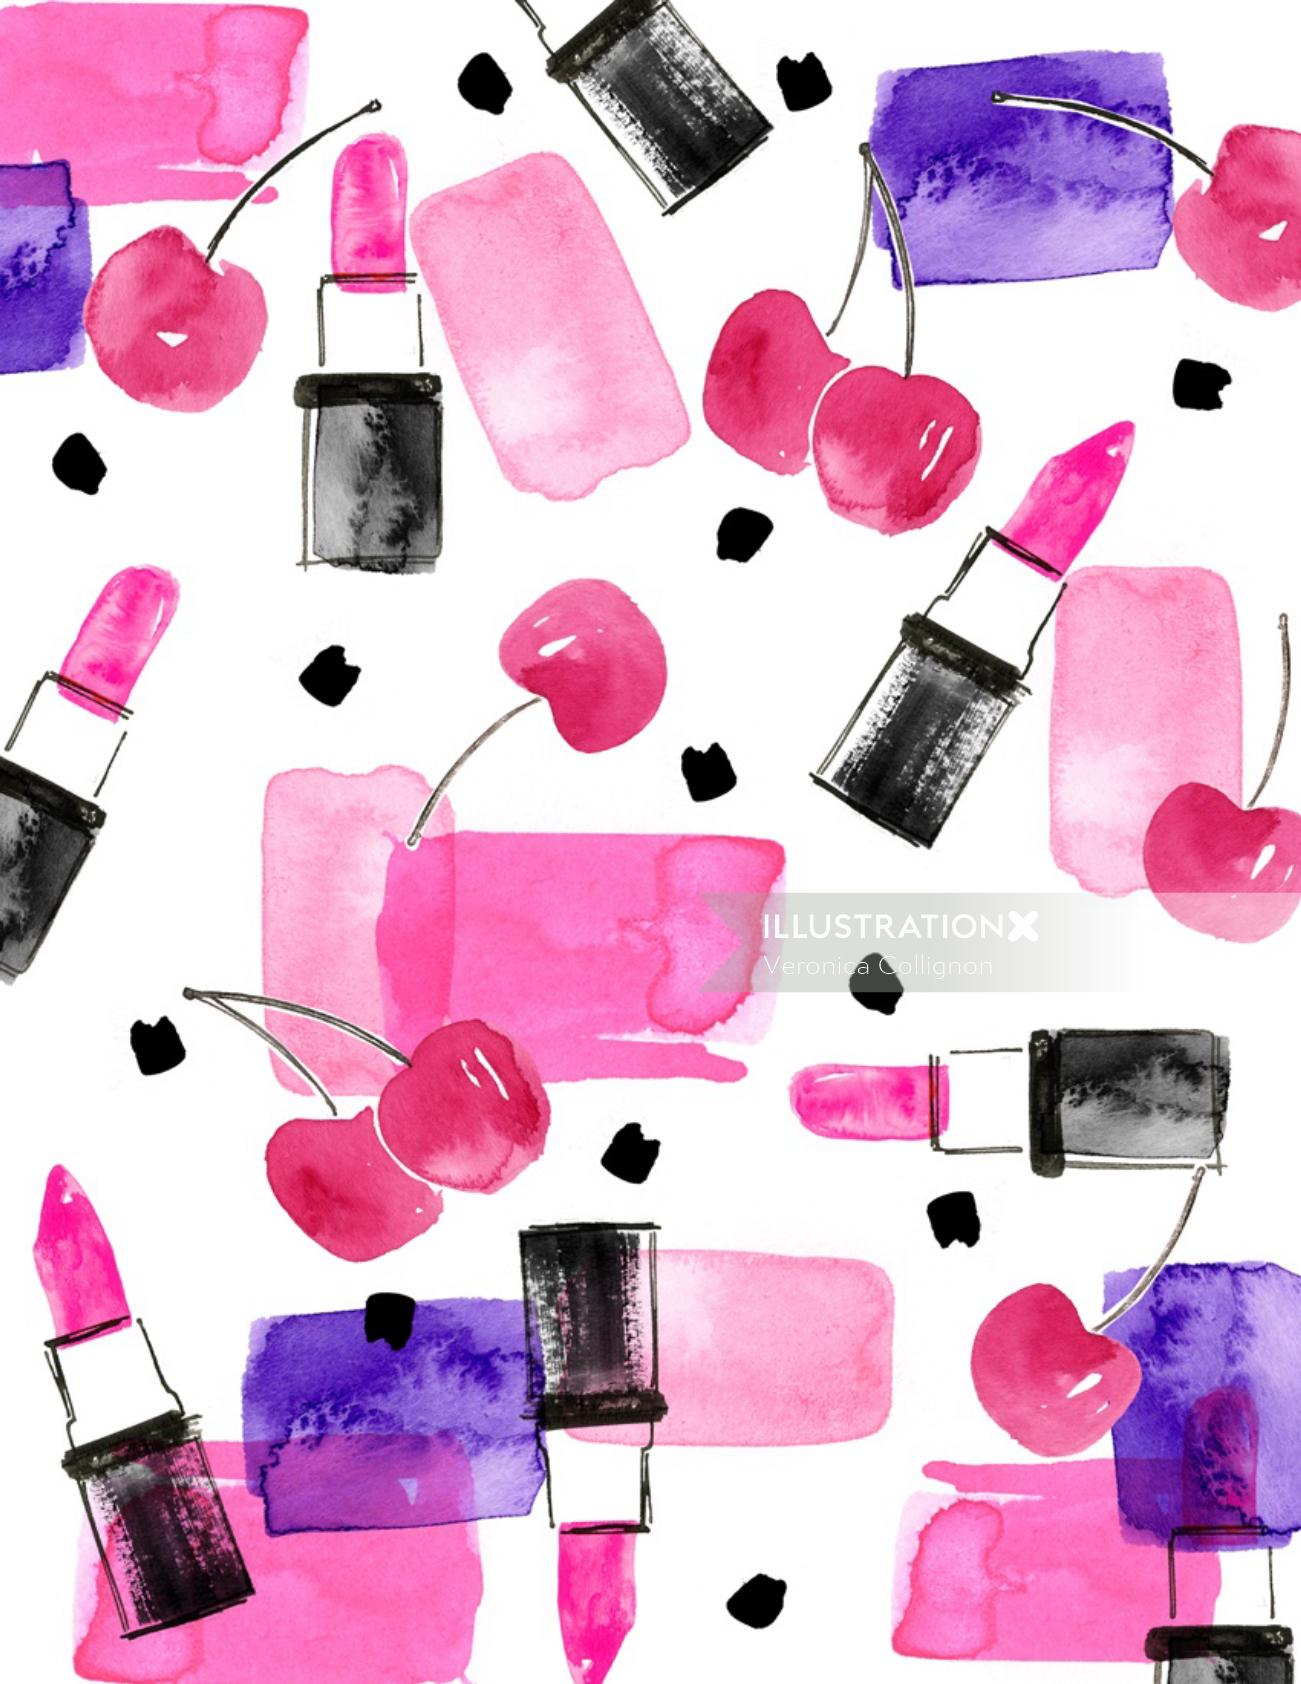 Pattern design of cherries and lipsticks